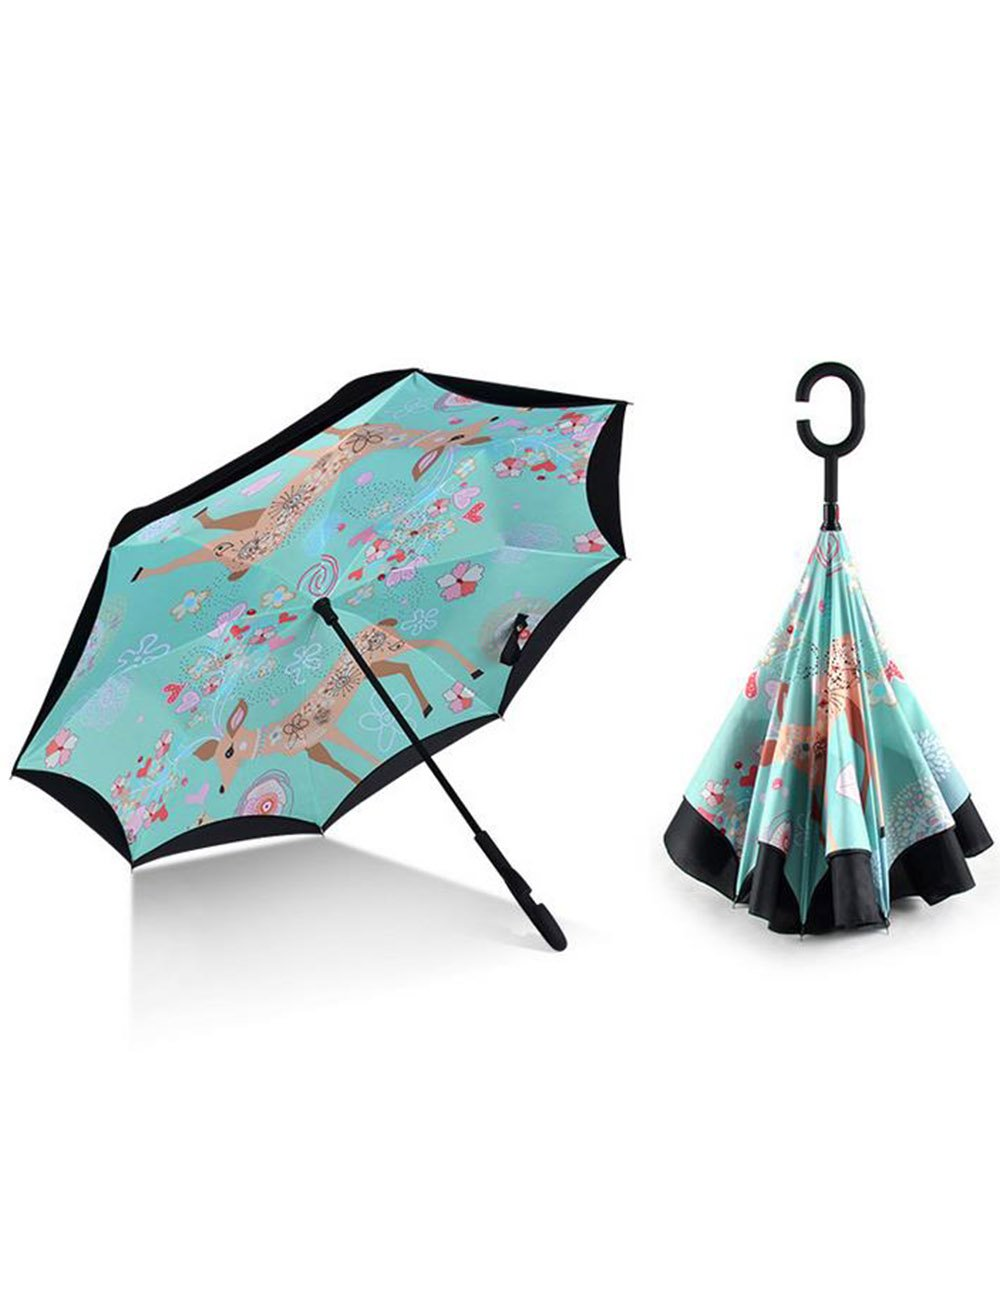 Haosen-six Creative Happy Elk Double Layer Windproof Rain Sun C Shape Handle Reverse Stick Umbrella For Car Outdoor Use